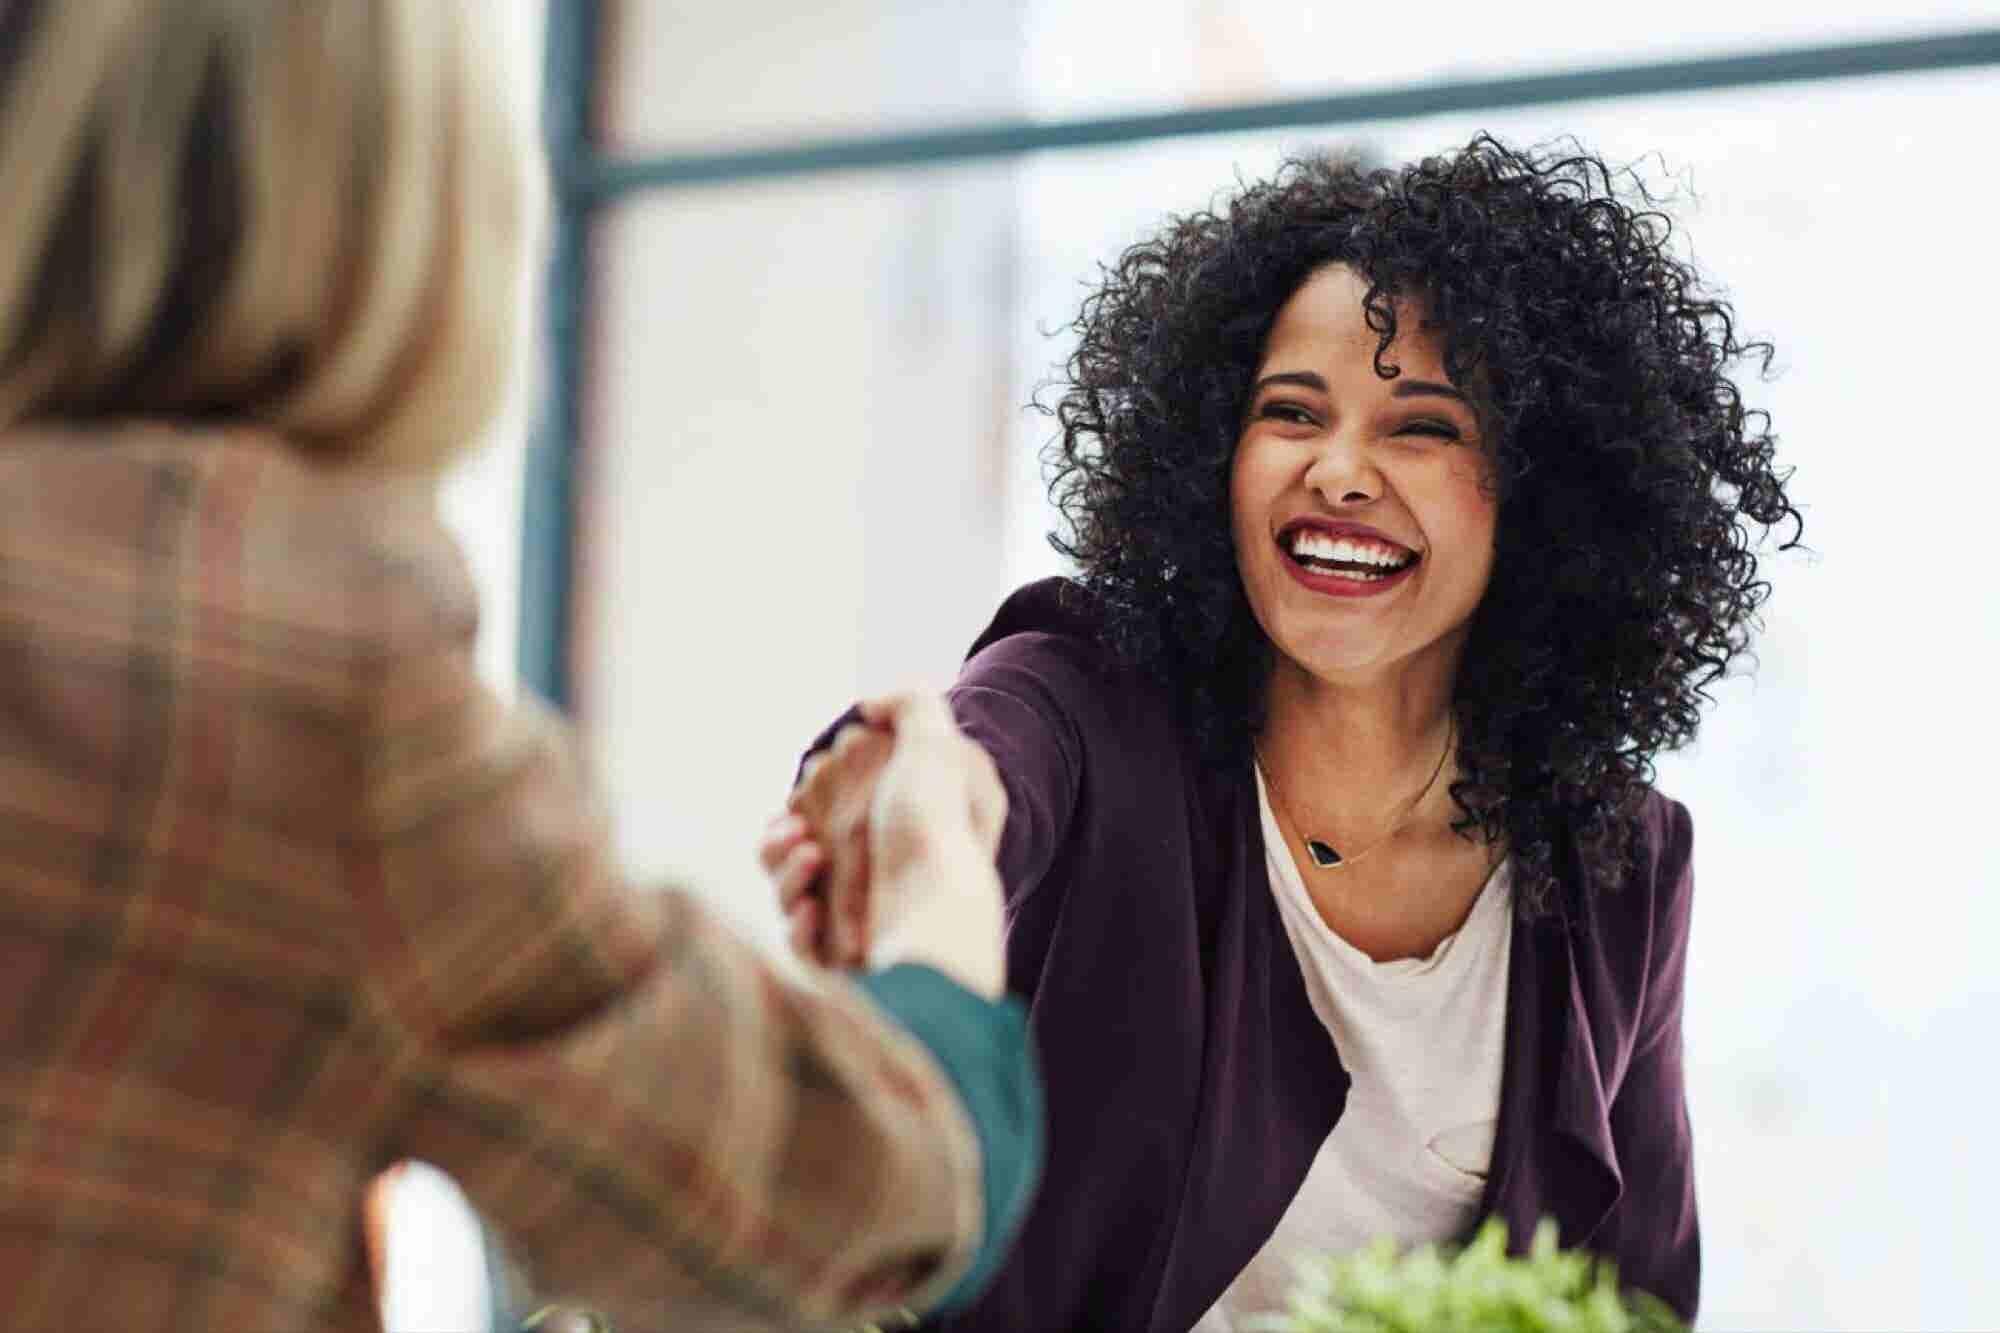 10 Steps to Help Get Your Career Back on Track